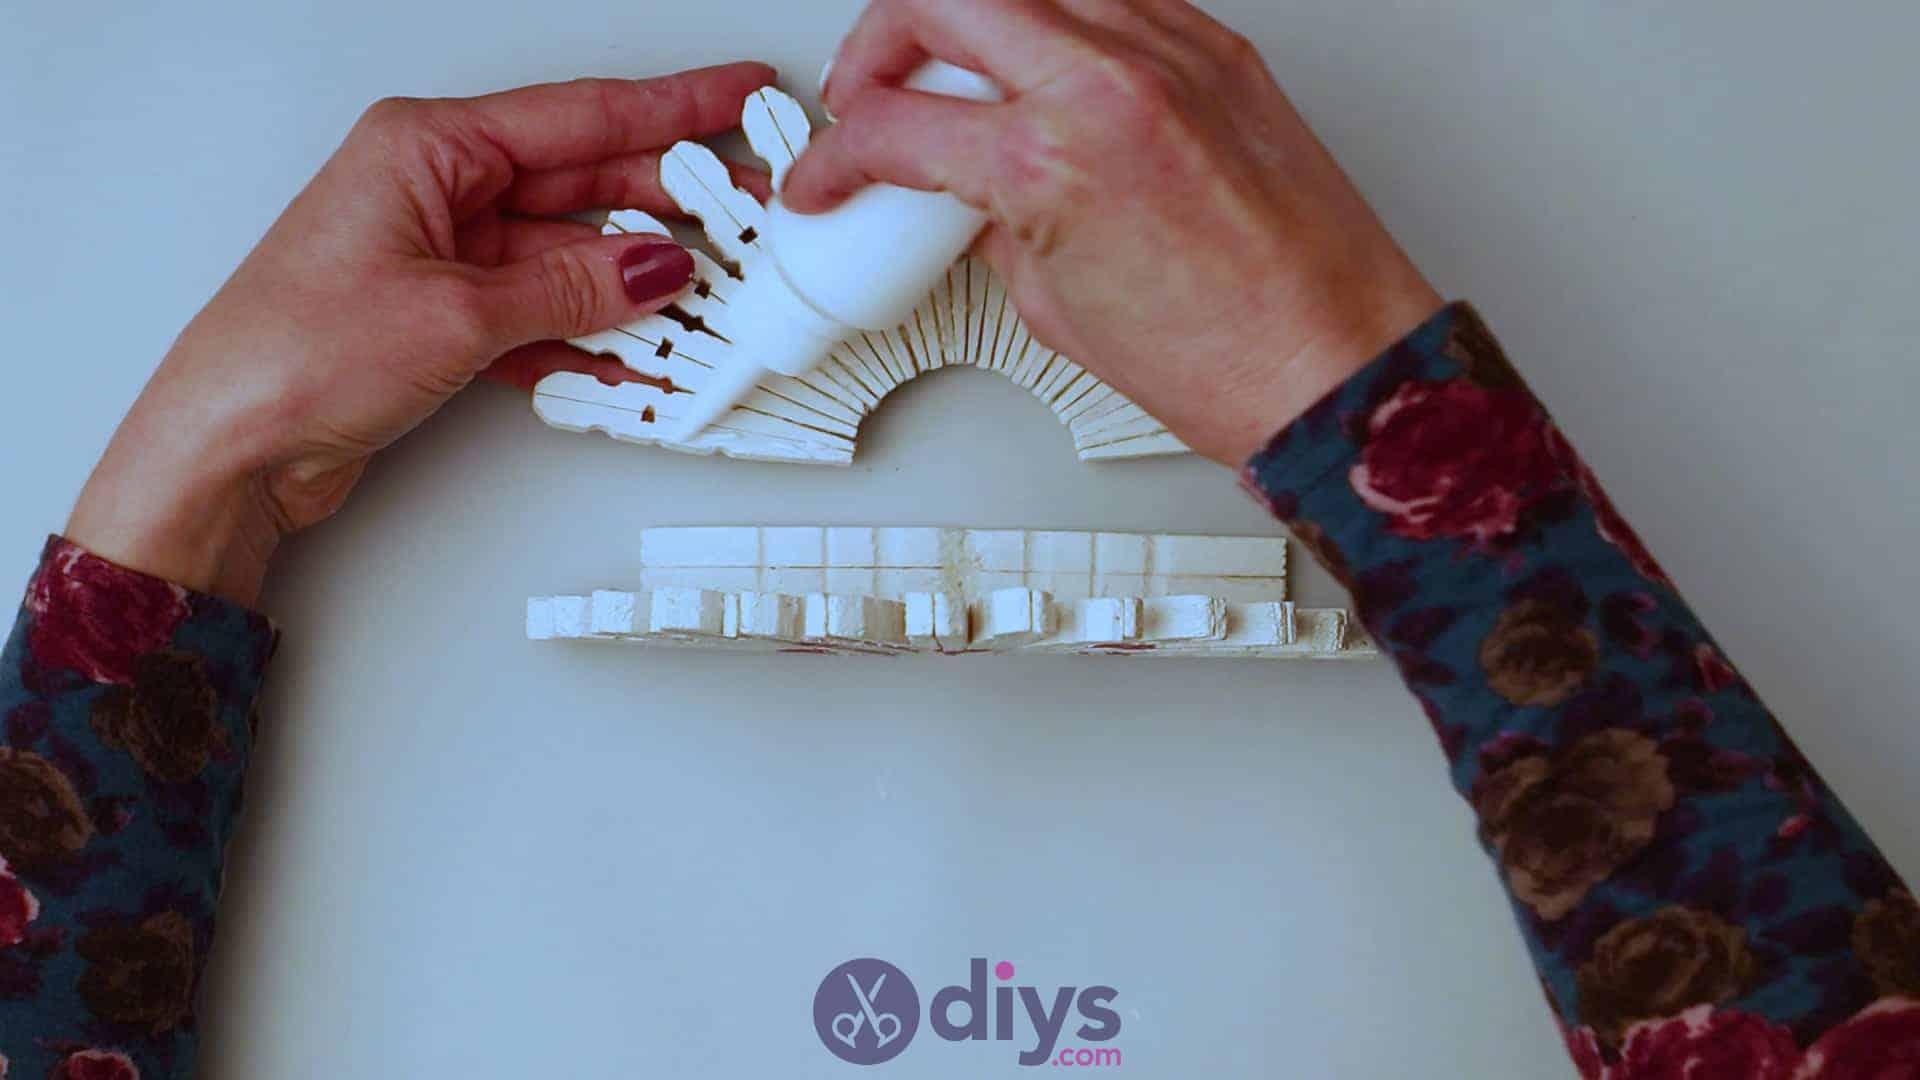 Diy clothespin napkin holder step 11b